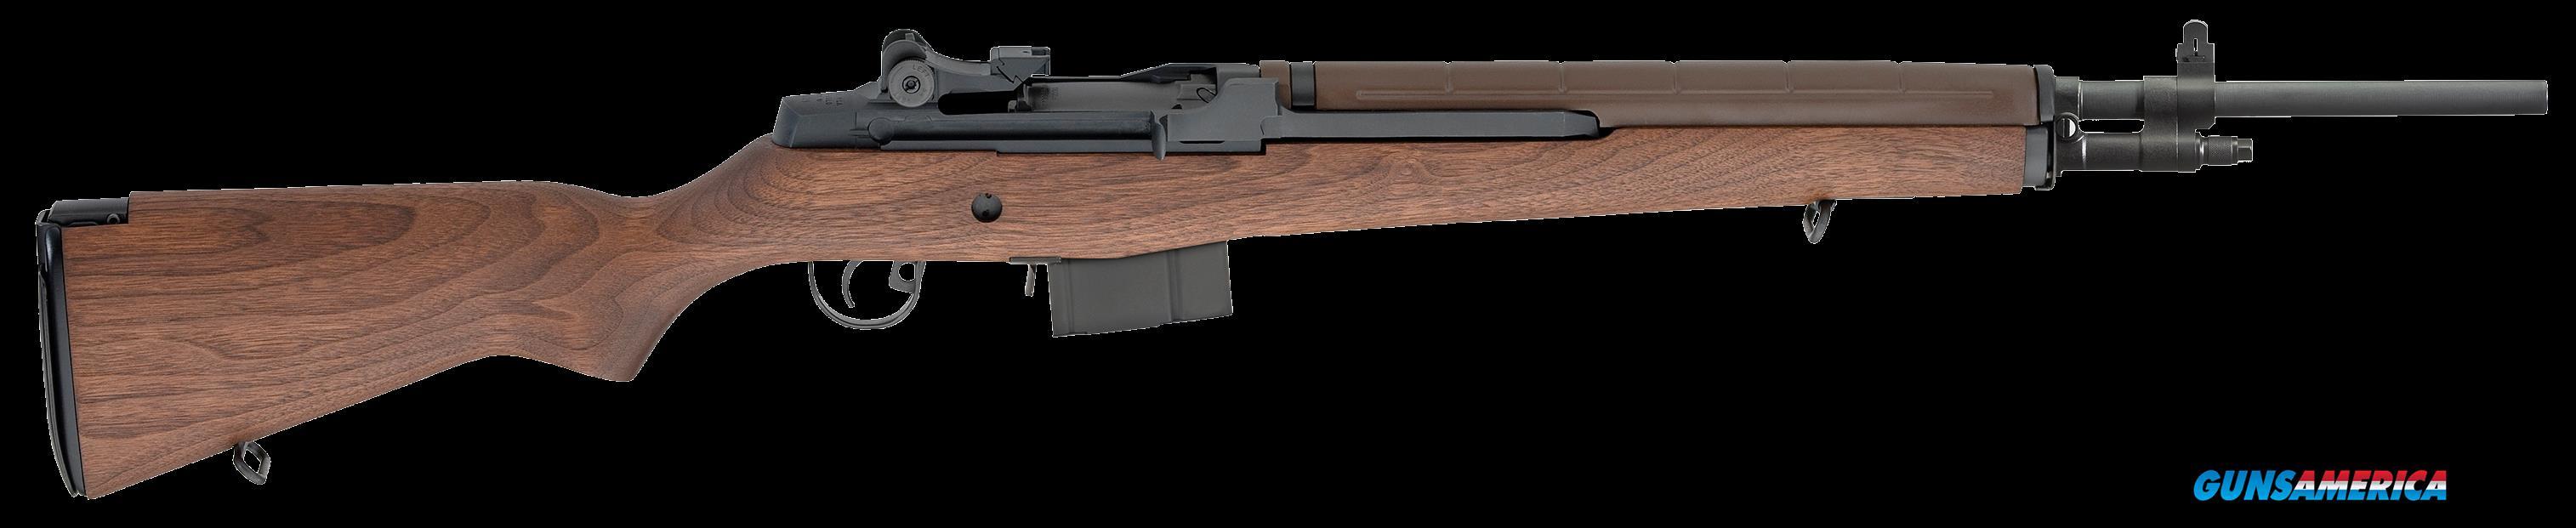 Springfield Armory M1a, Spg Ma9222nt    M1a Ld Std   7.62   Wal     *ny*  Guns > Pistols > 1911 Pistol Copies (non-Colt)